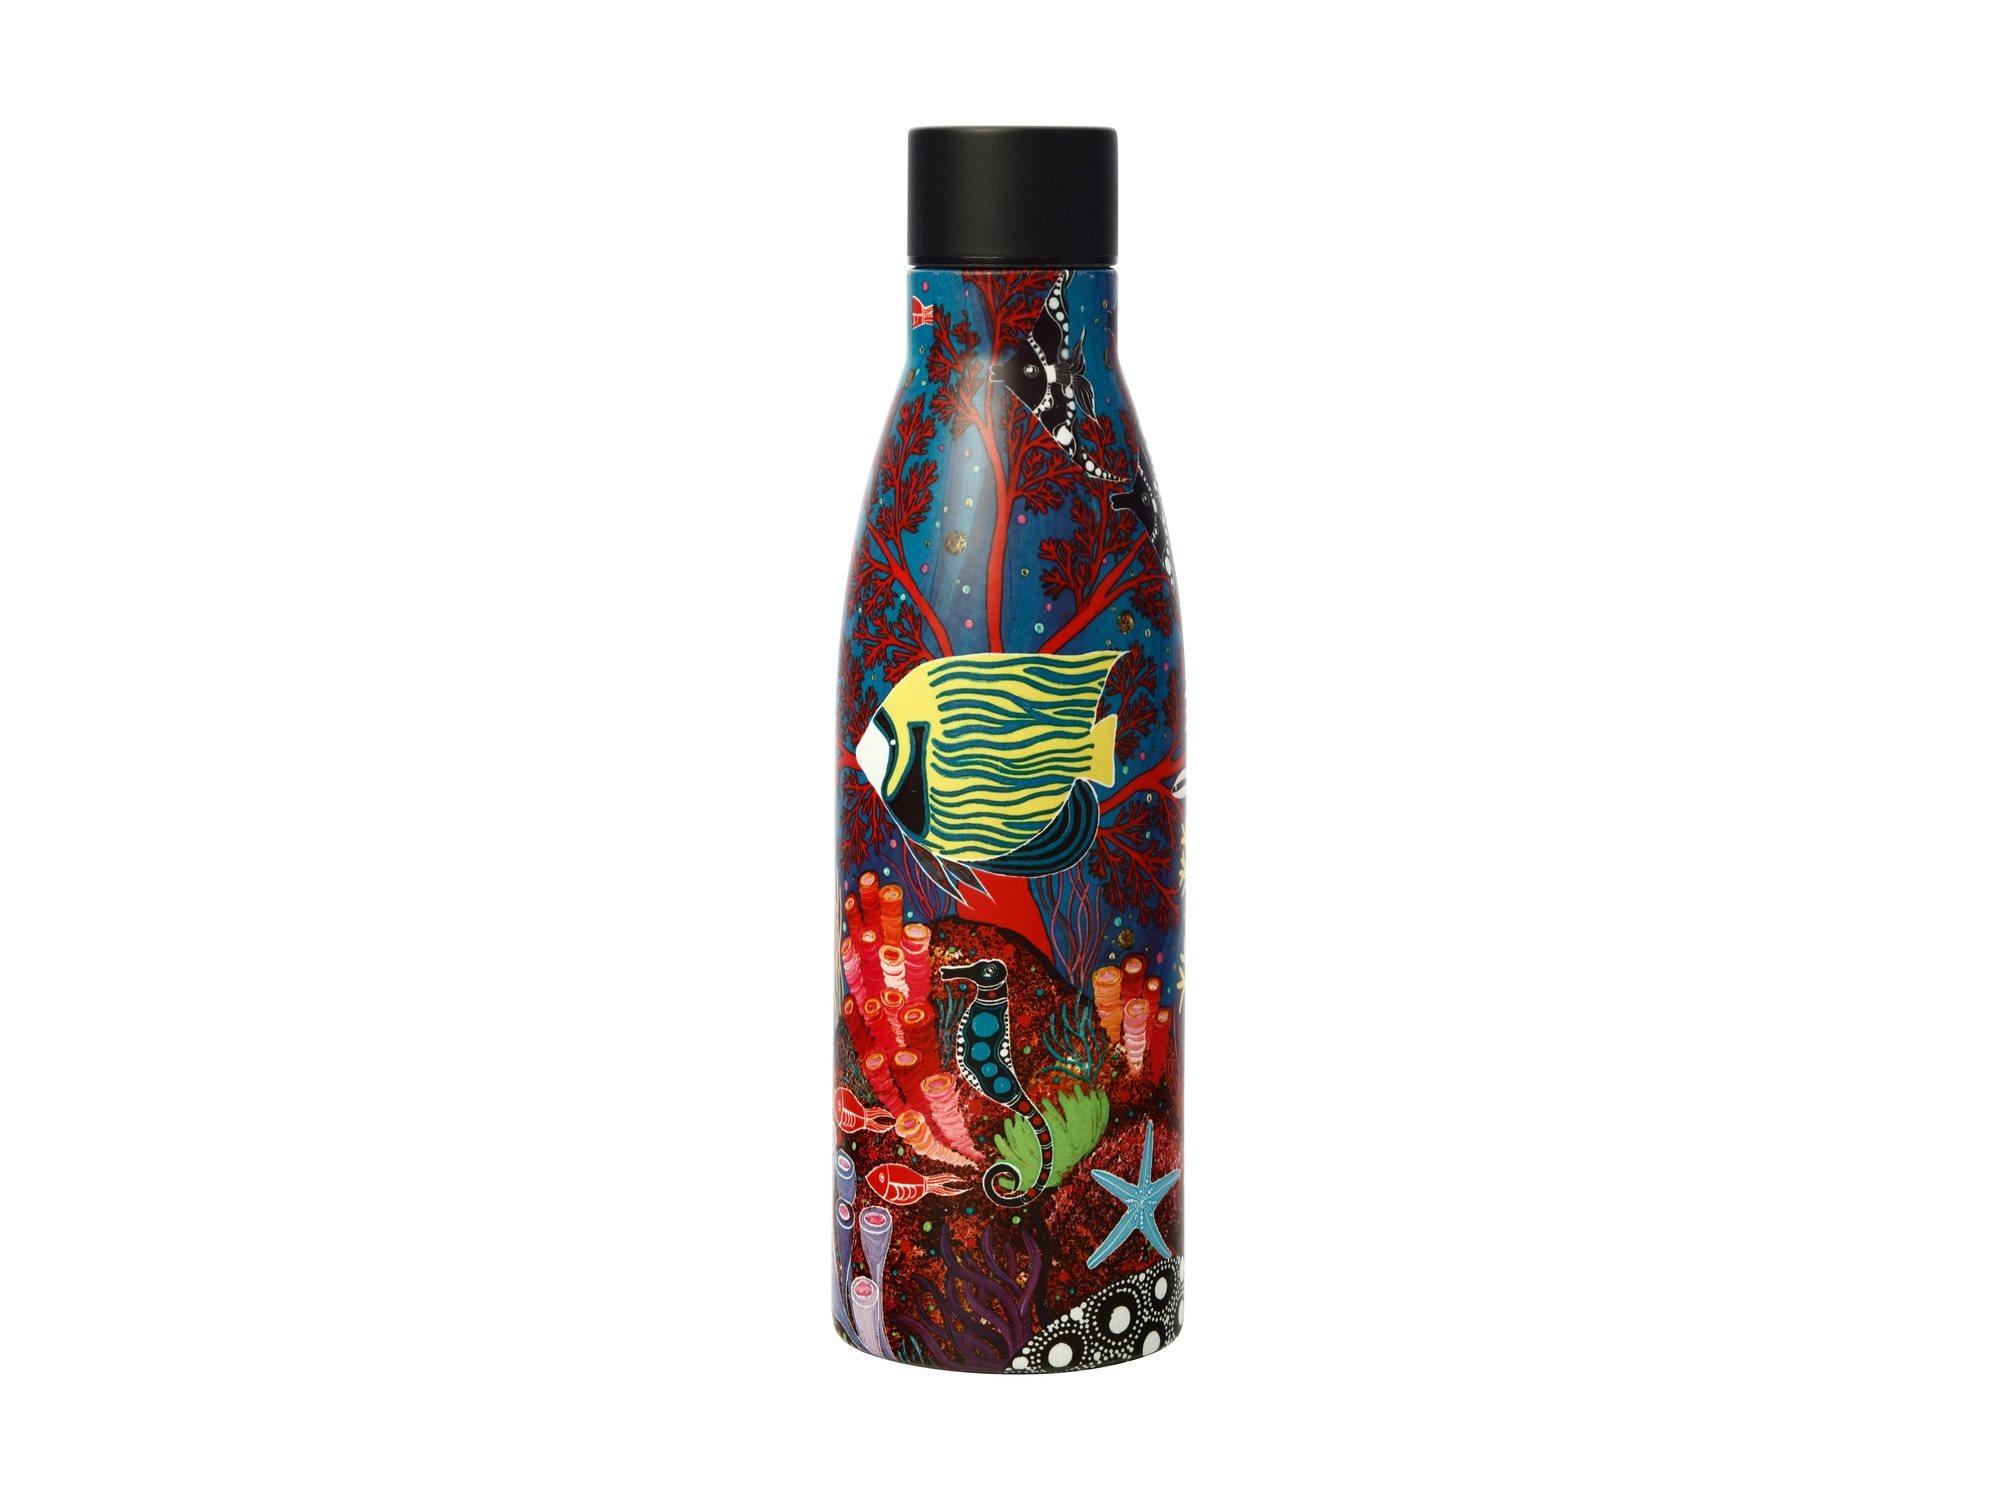 Maxwell & Williams Ανοξείδωτο Θερμομονωτικό Μπουκάλι Melanie Hava Jugaig-Bana-Wabu Reef Wonderland 0.50lt